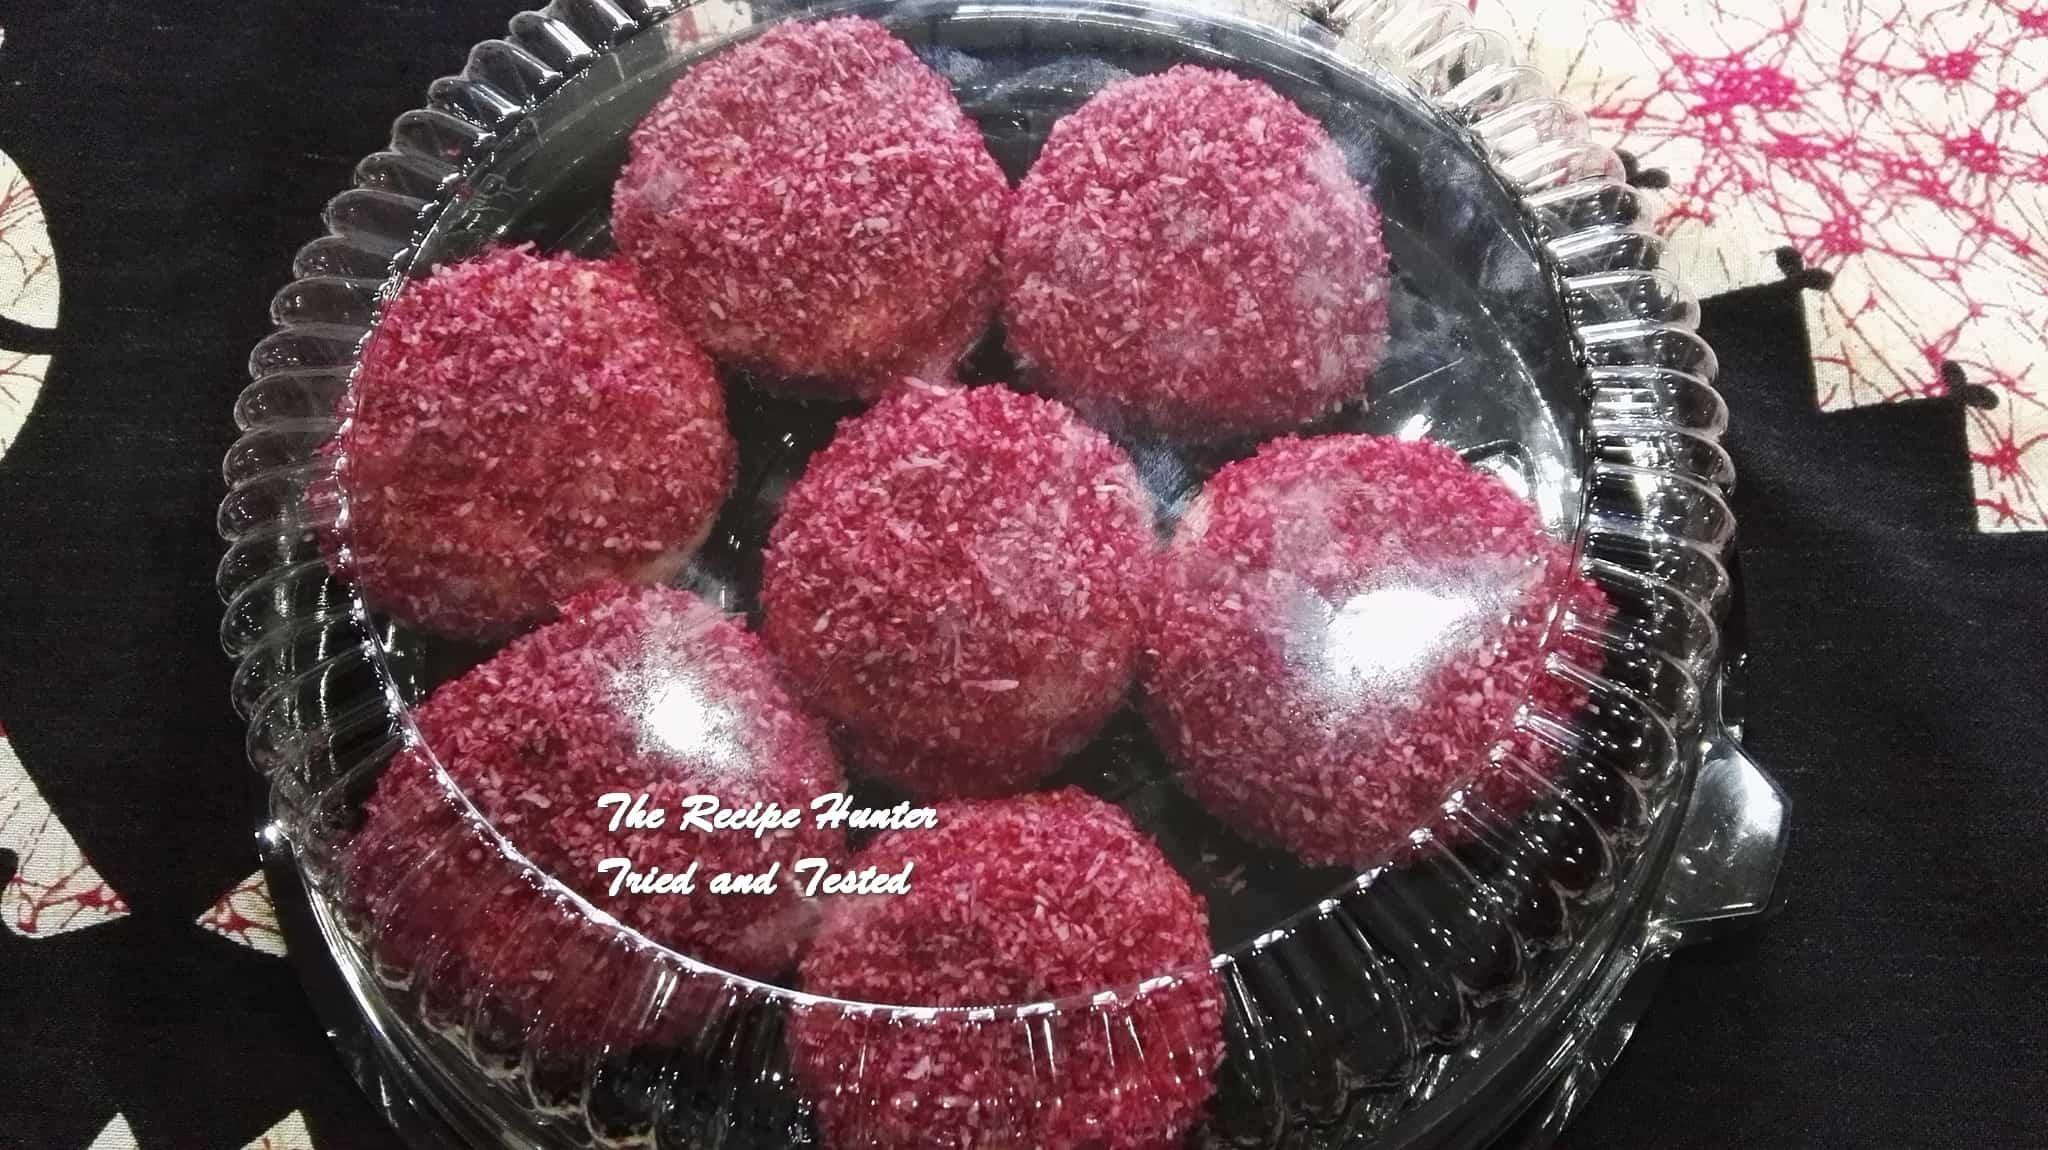 trh-surekas-eggless-snowballs